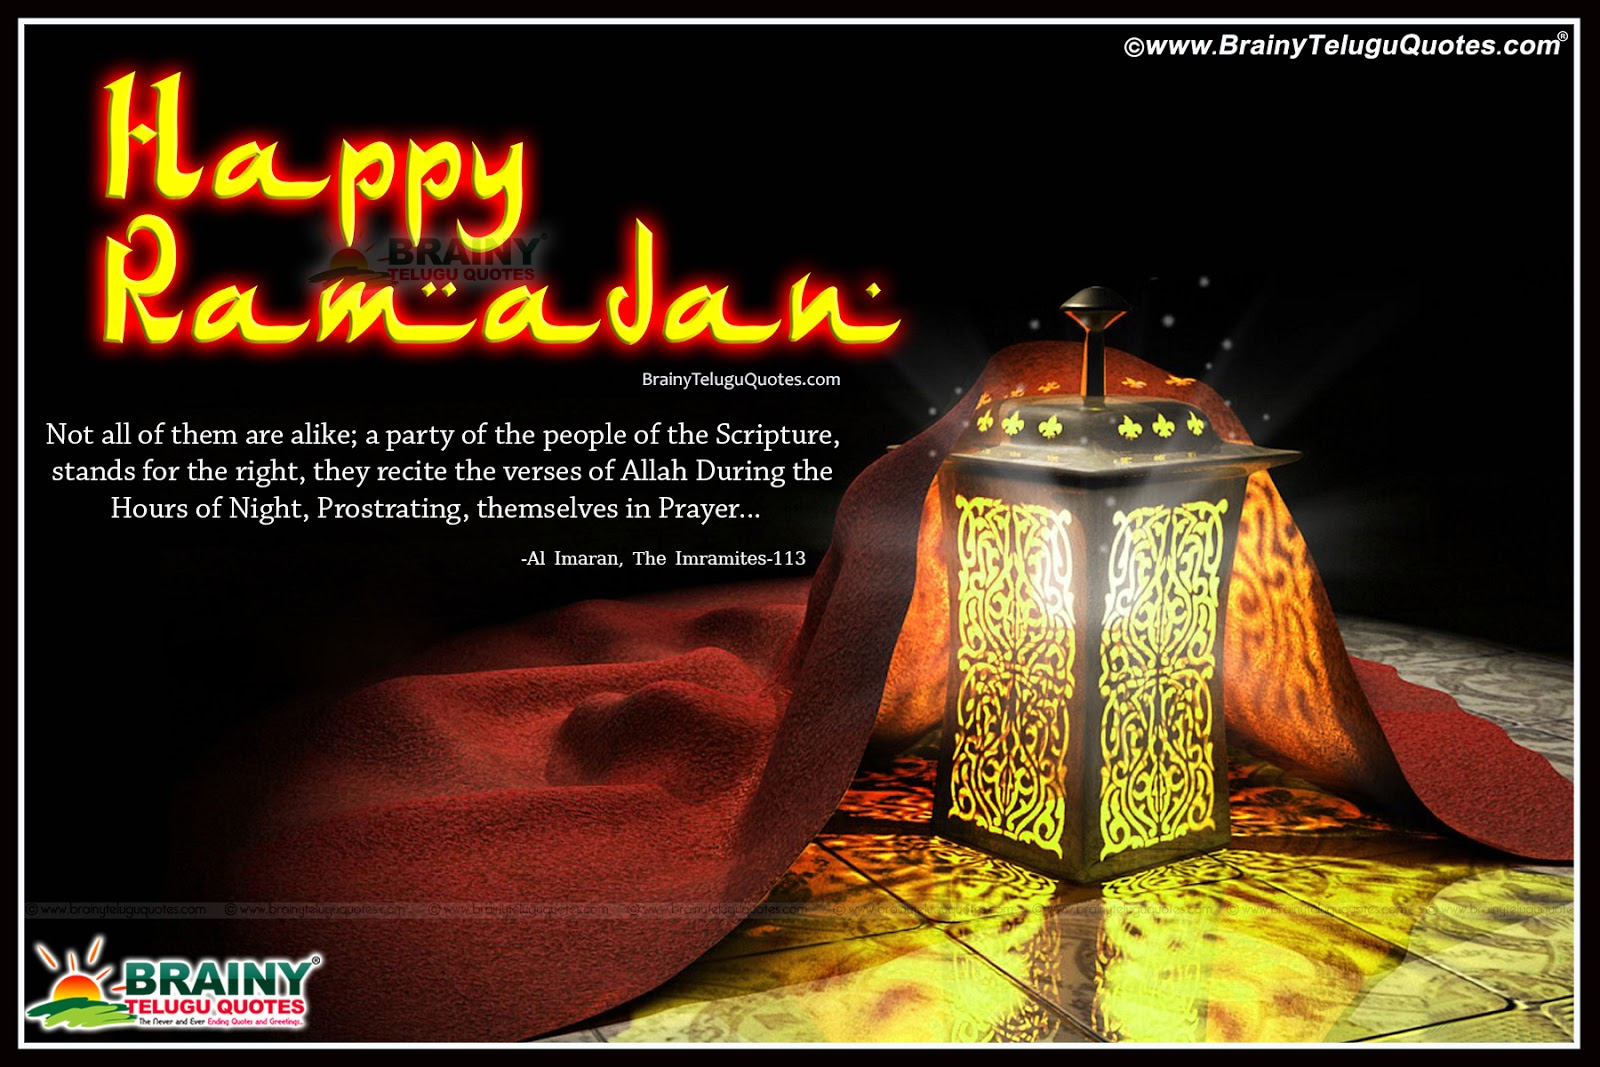 Ramadan picture sms greetings messages brainyteluguquotes eid mubarak and ramadan festival sms and nice greetings in english language best english ramadan prosper wishes and best greetings sms online nice ramadan kristyandbryce Gallery